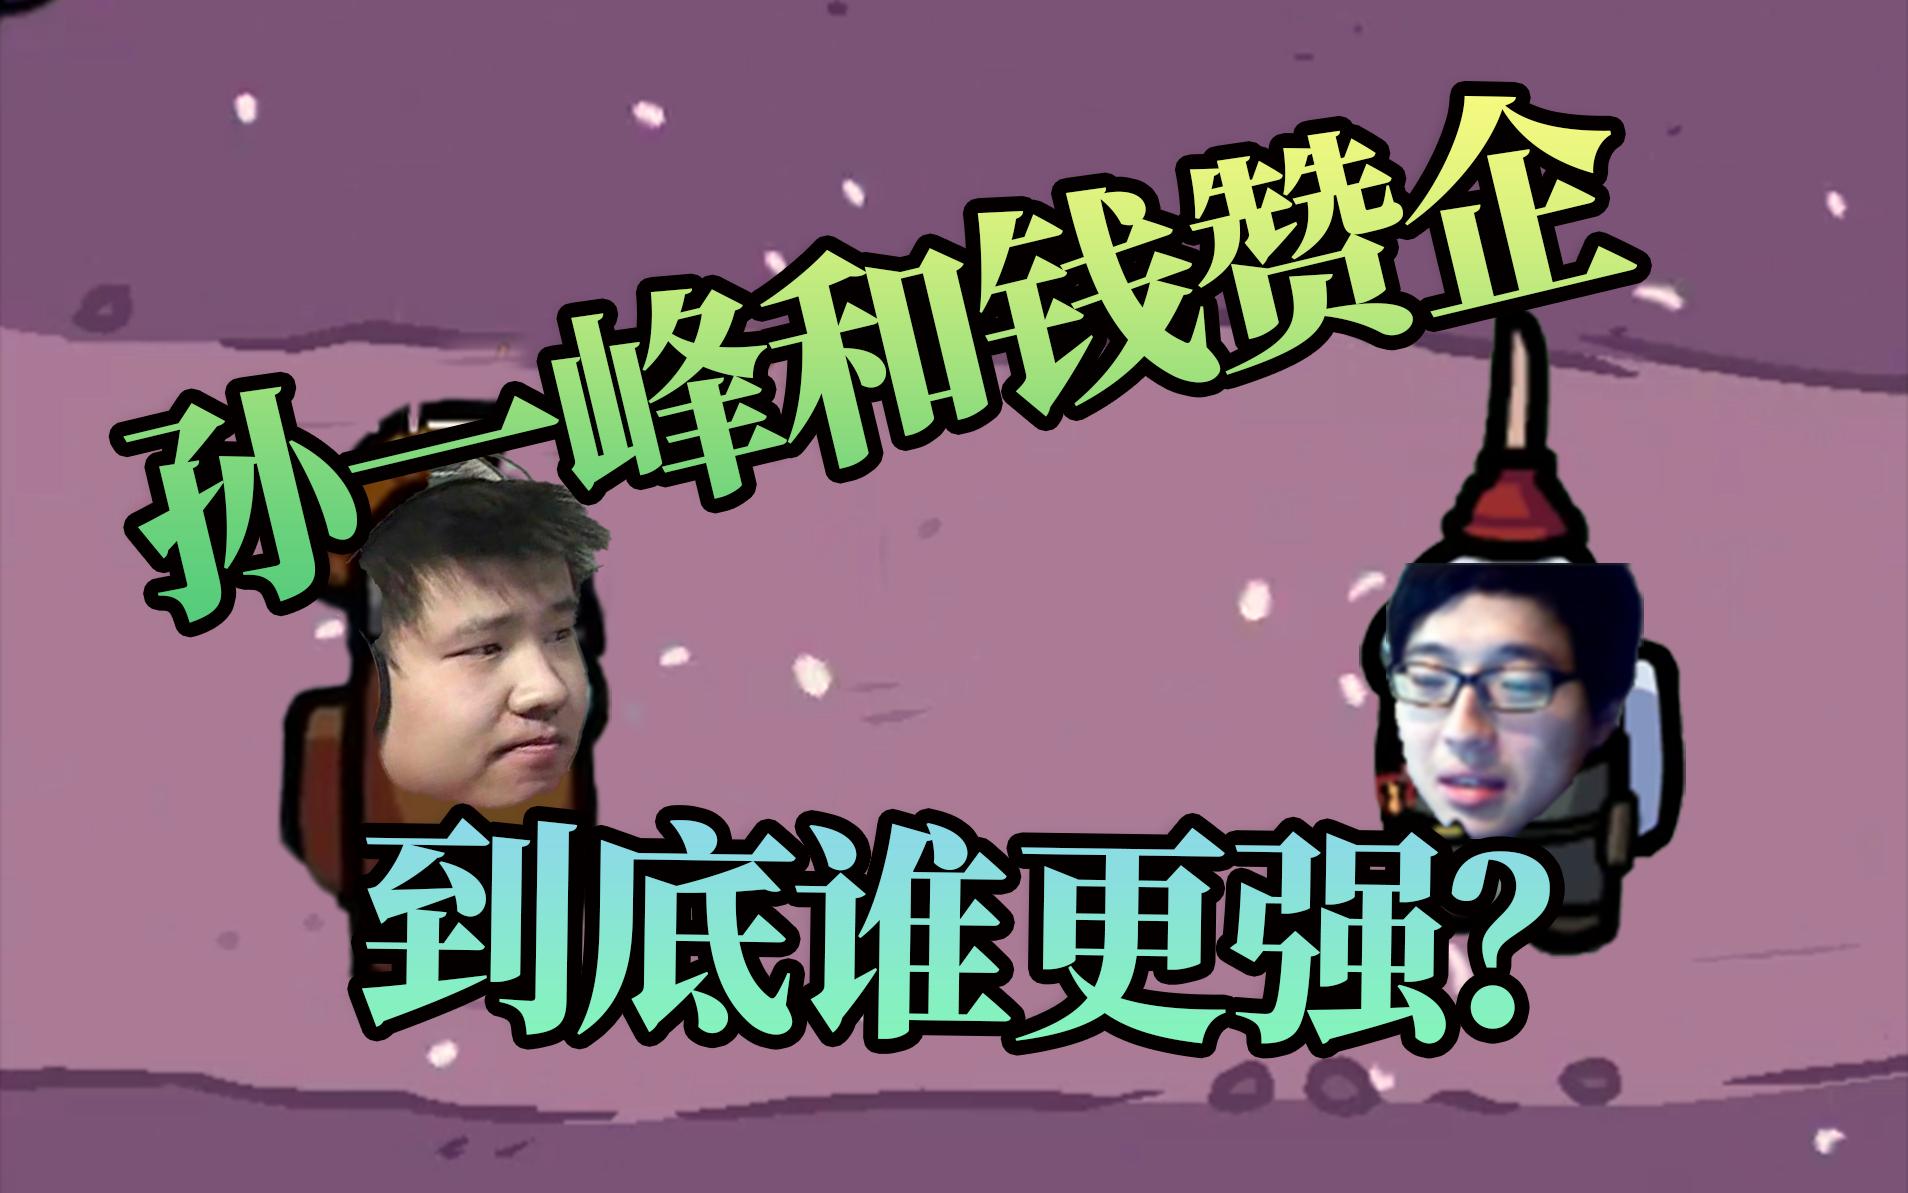 【Among us】小丑狼人杀 第2期 :孙一峰和钱赞企,到底谁比较强?